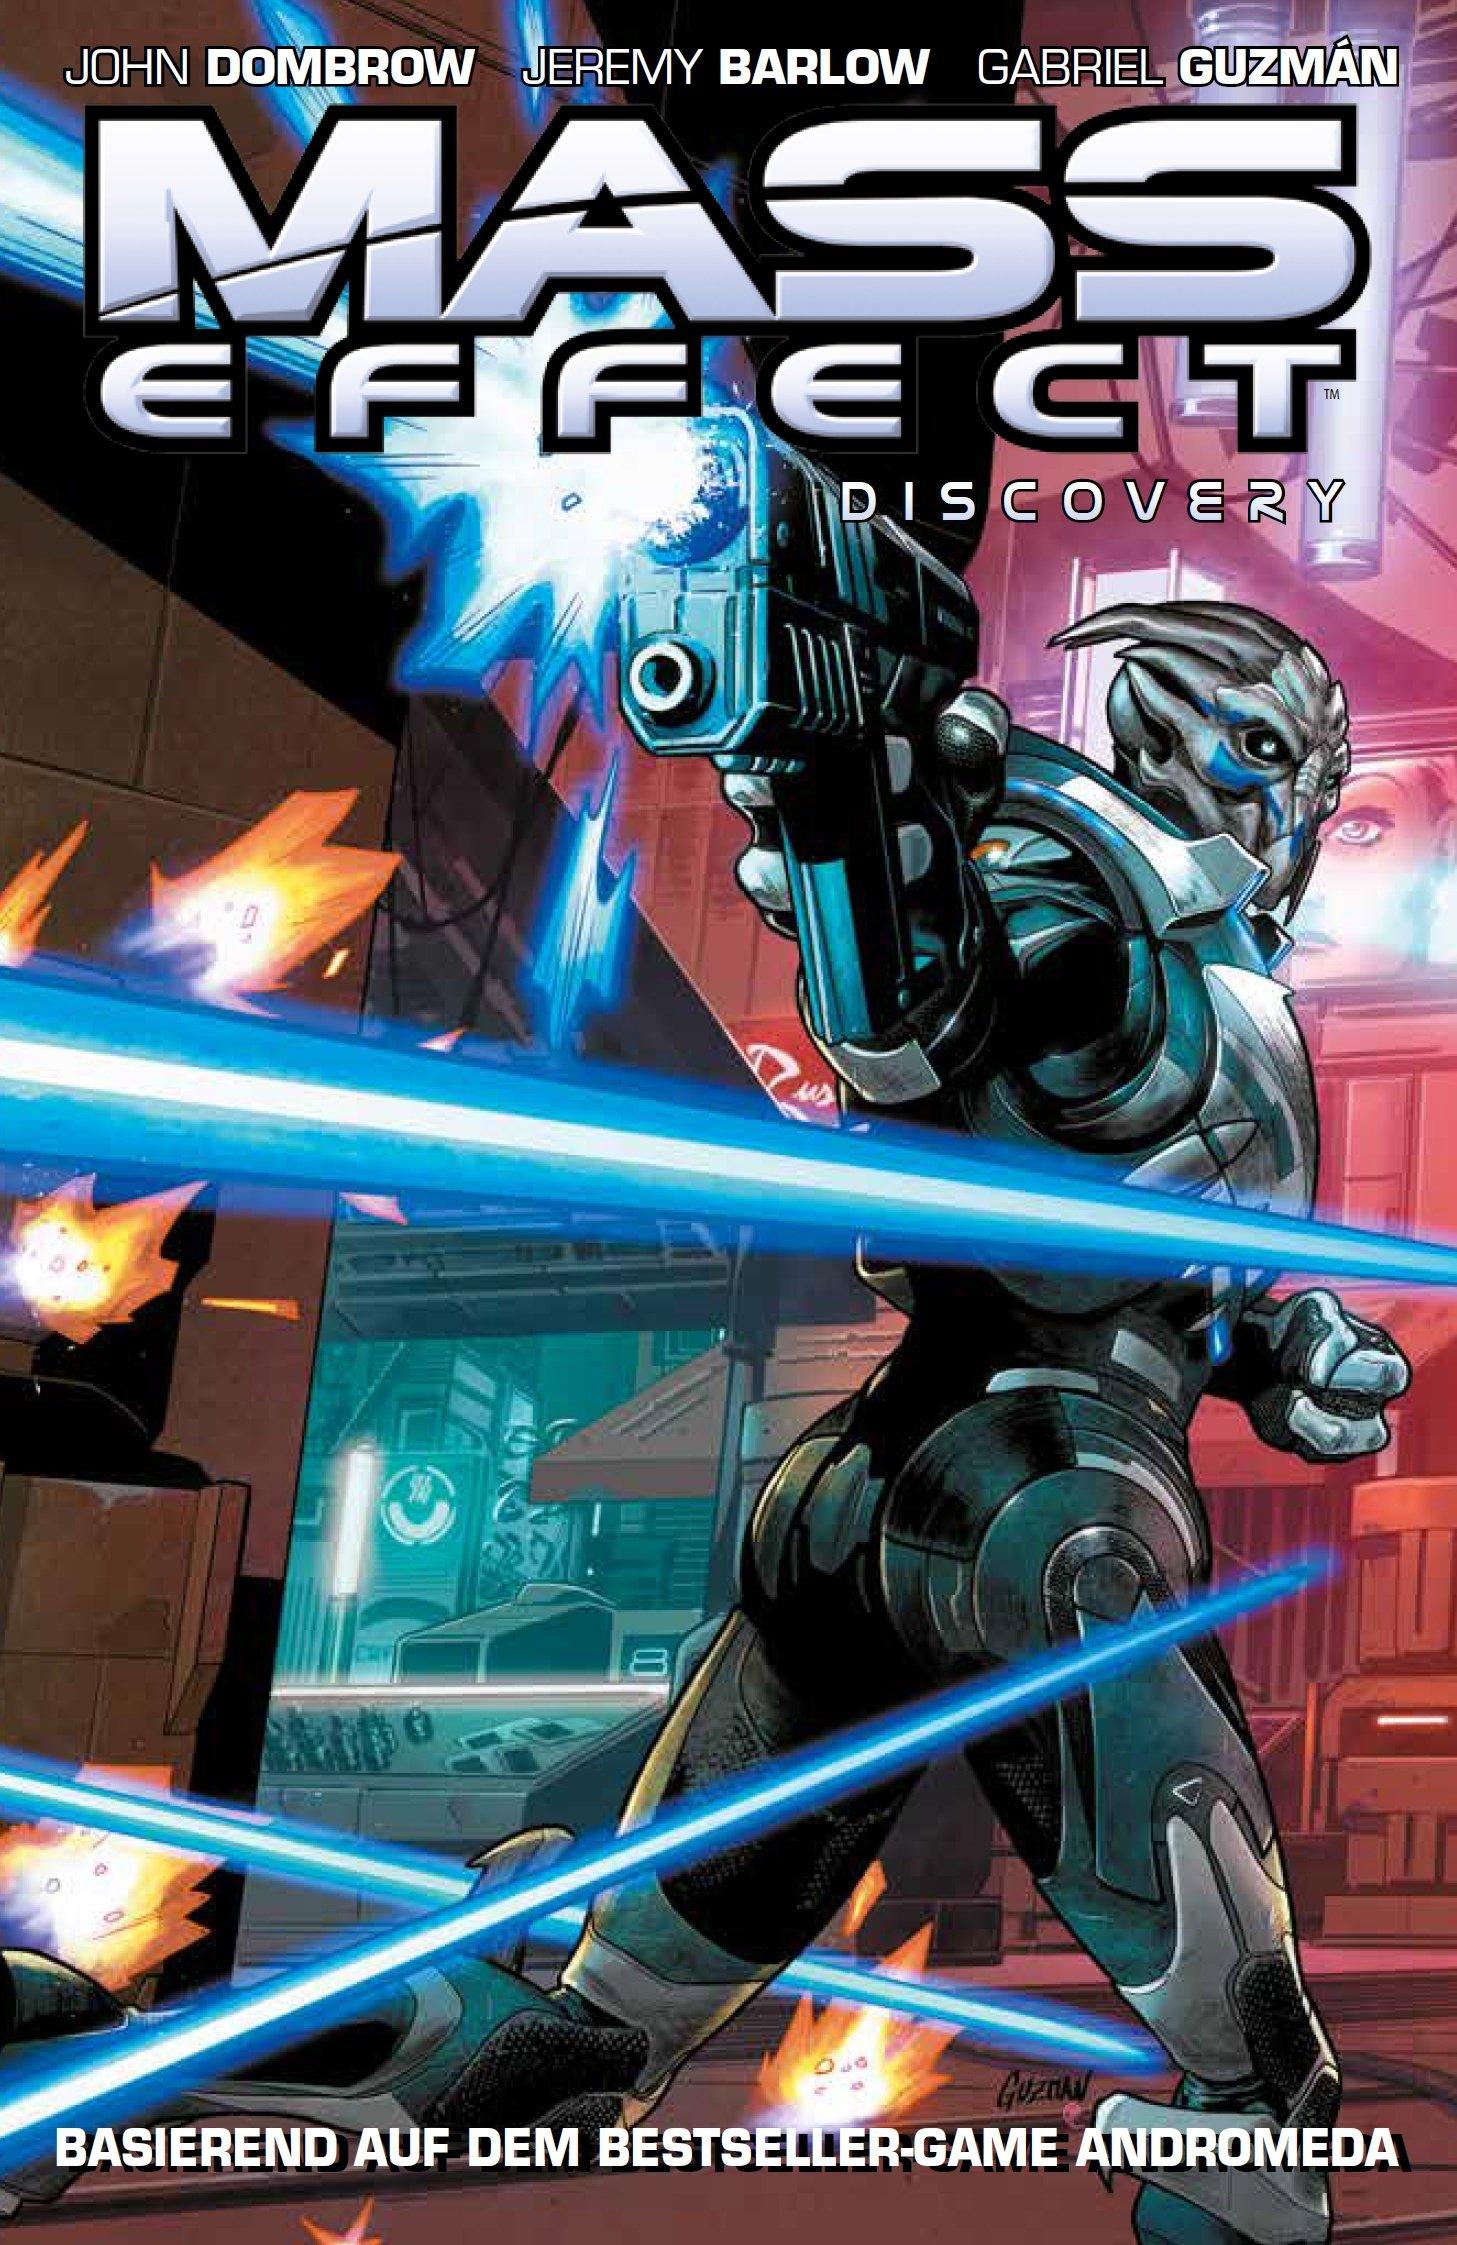 Mass Effect: Discovery: Basierend auf dem Bestseller-Game Andromeda Taschenbuch – 13. Februar 2018 John Dombrow Jeremy Barlow Gabriel Guzman Claudia Fliege